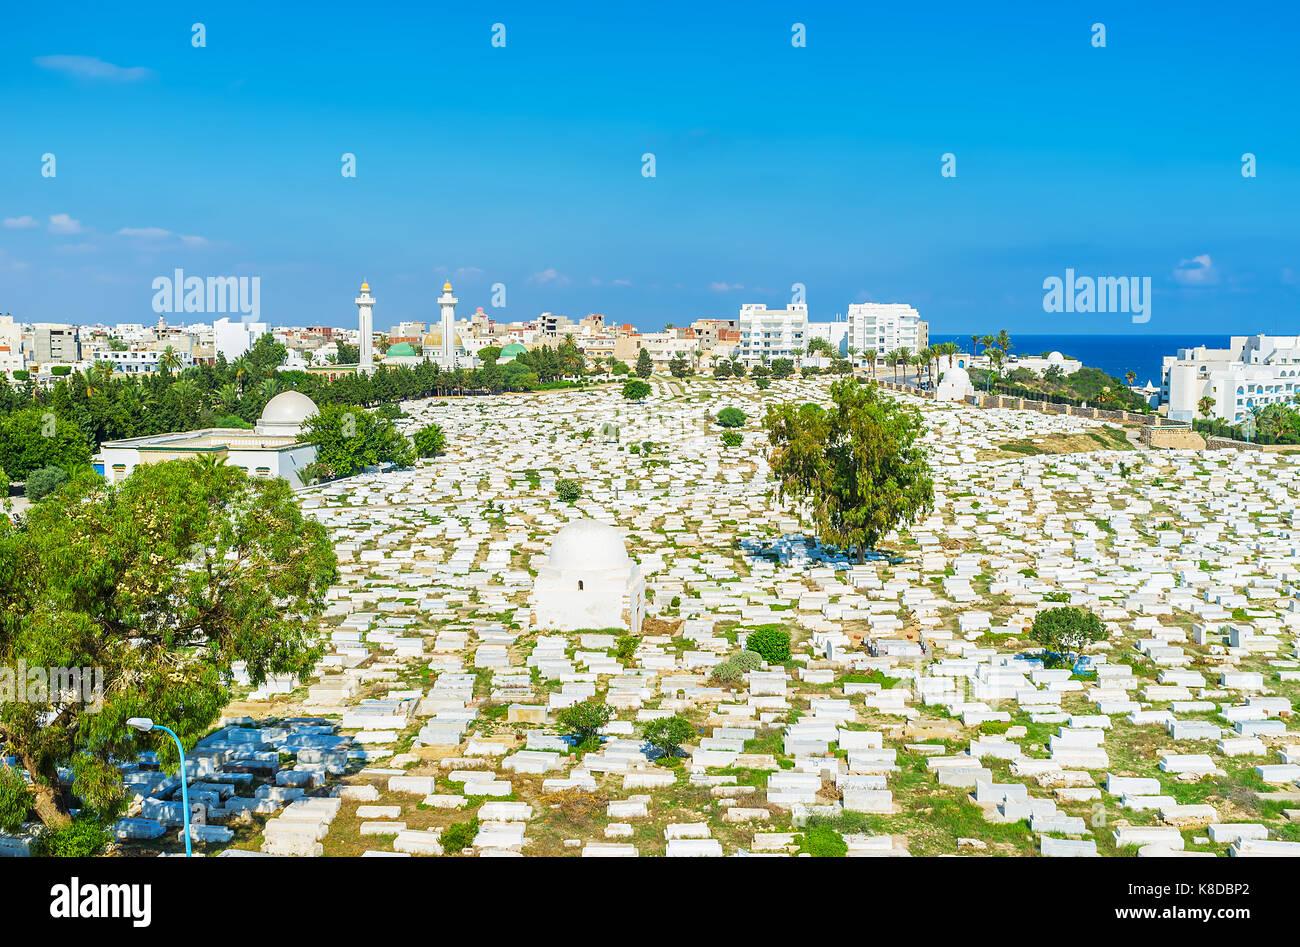 Vista aérea de Sidi el-mezeri histórico cementerio con dos minaretes de Habib Bourguiba mausoleo en el fondo, Monastir, Foto de stock